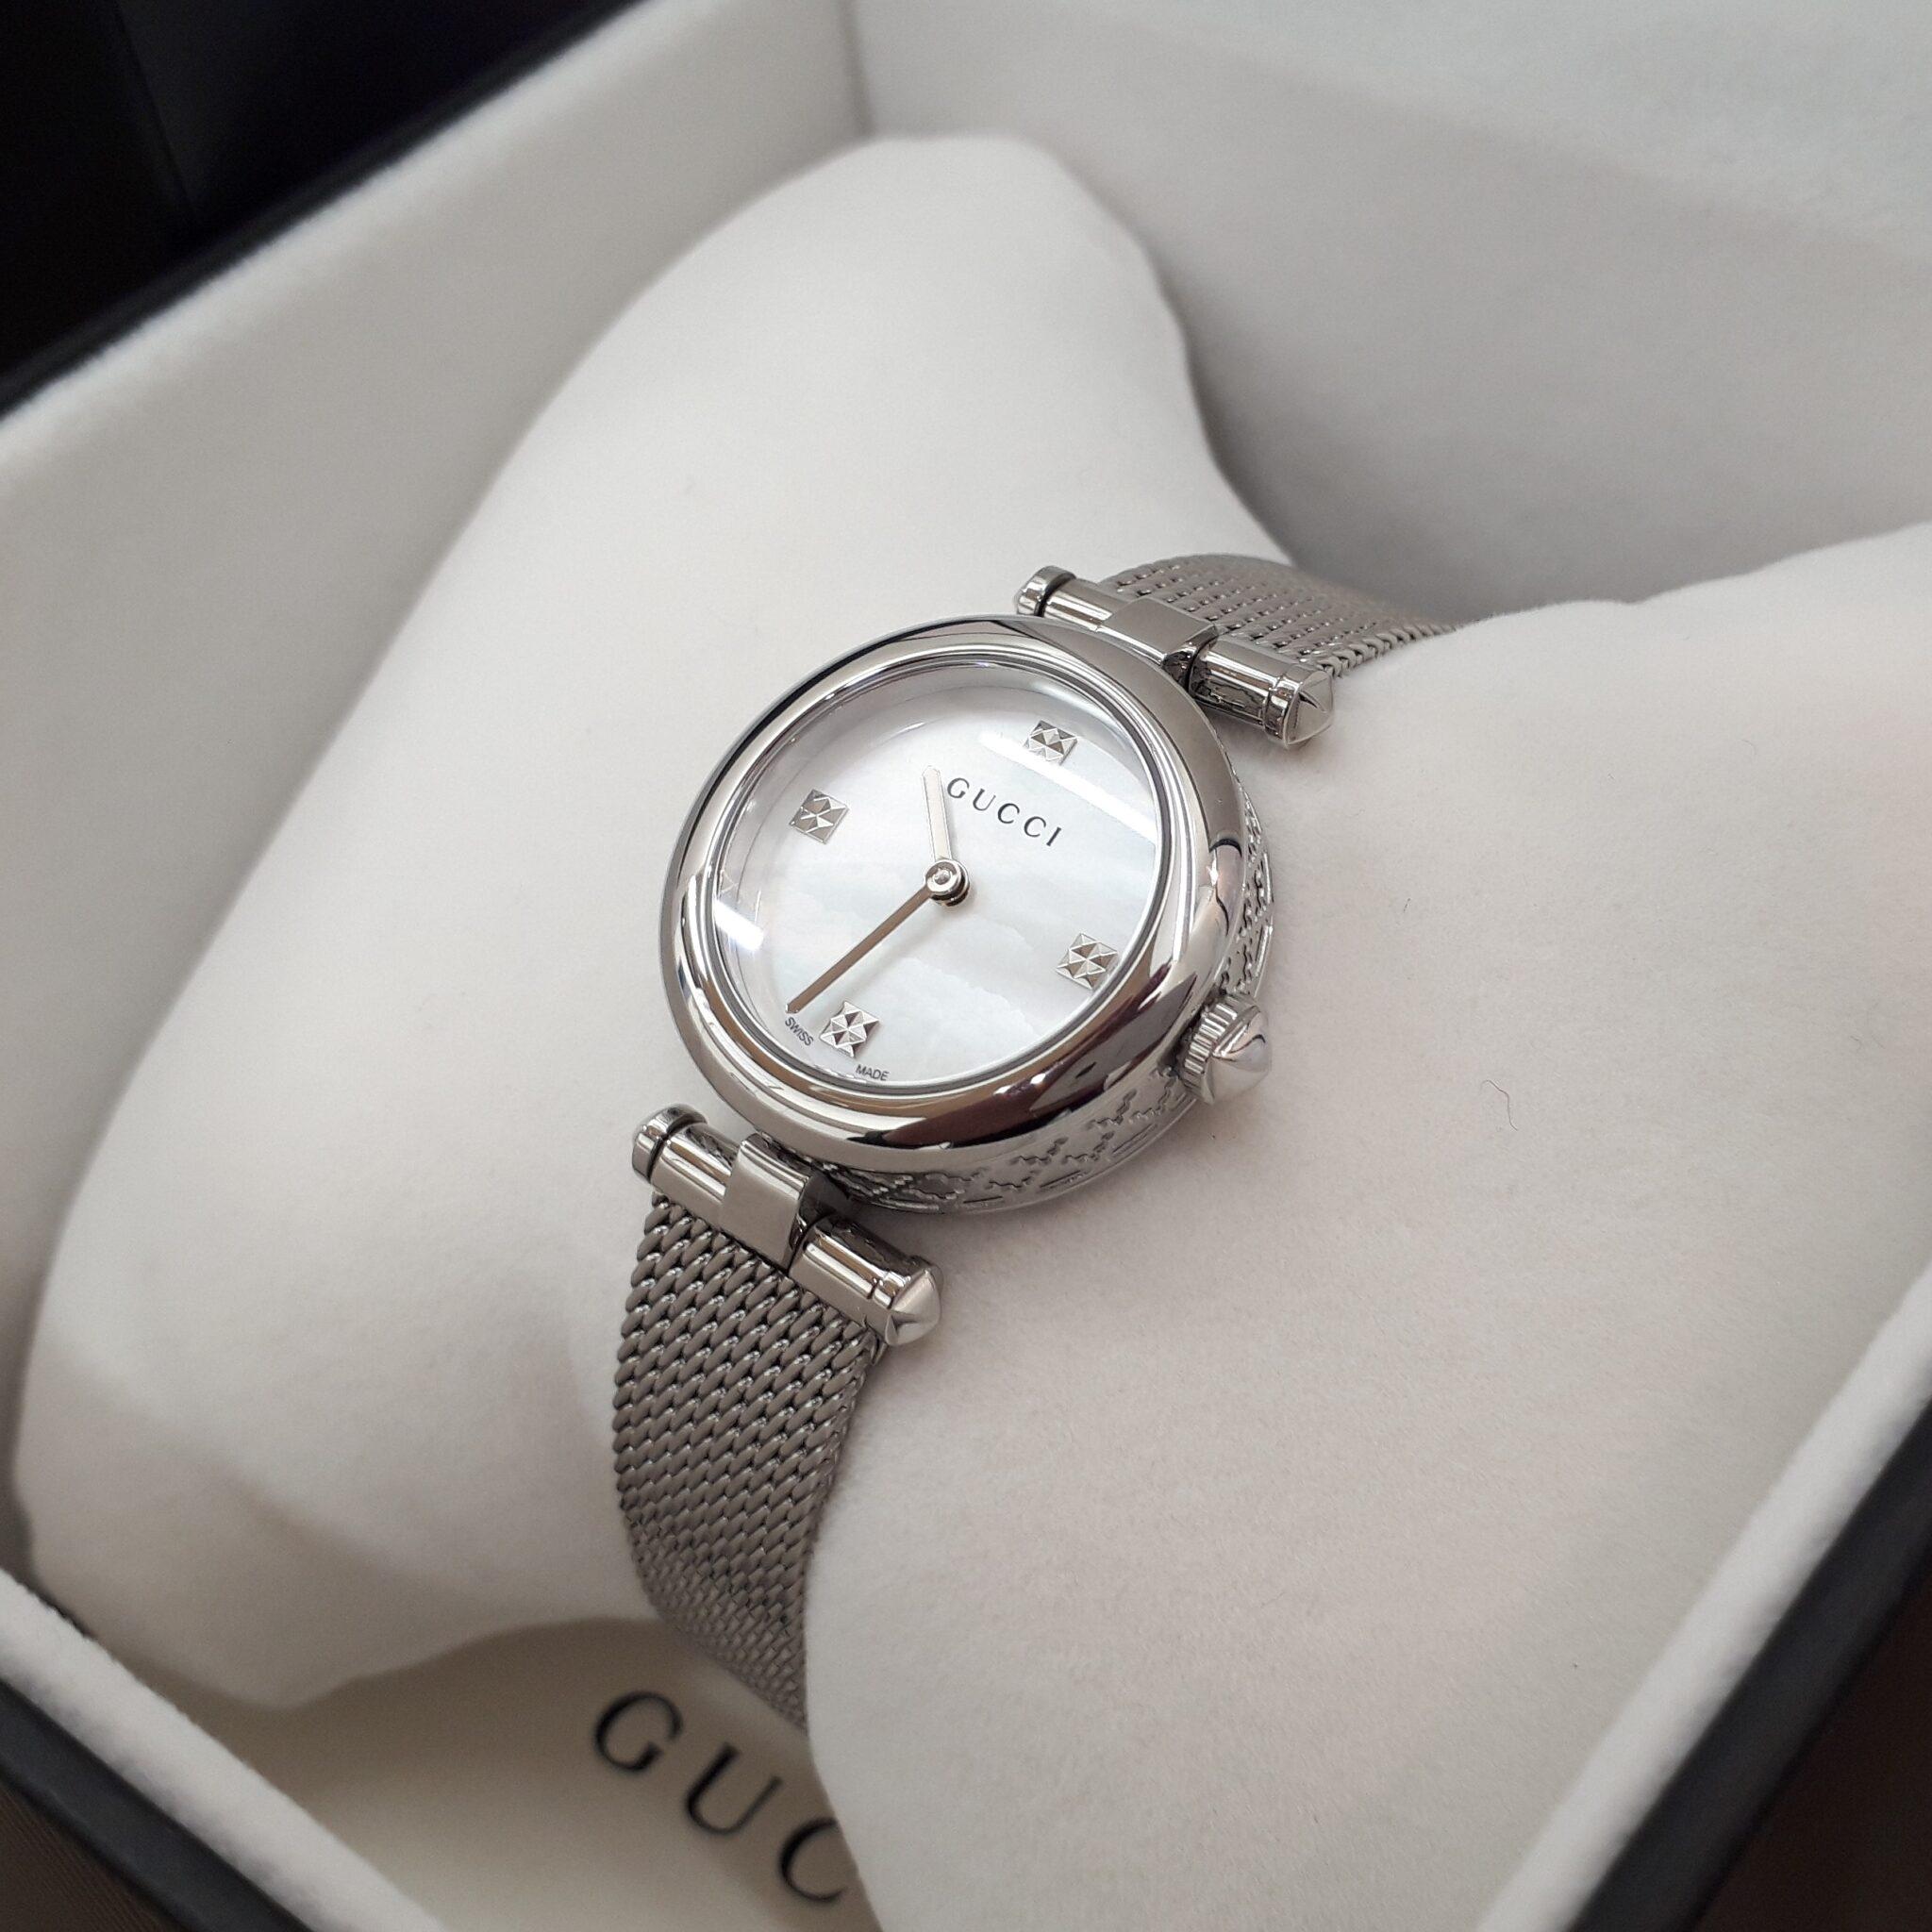 【GUCCI YA141512 ディアマンティッシマ レディース時計】を盛岡市のお客様よりお買取させていただきました!